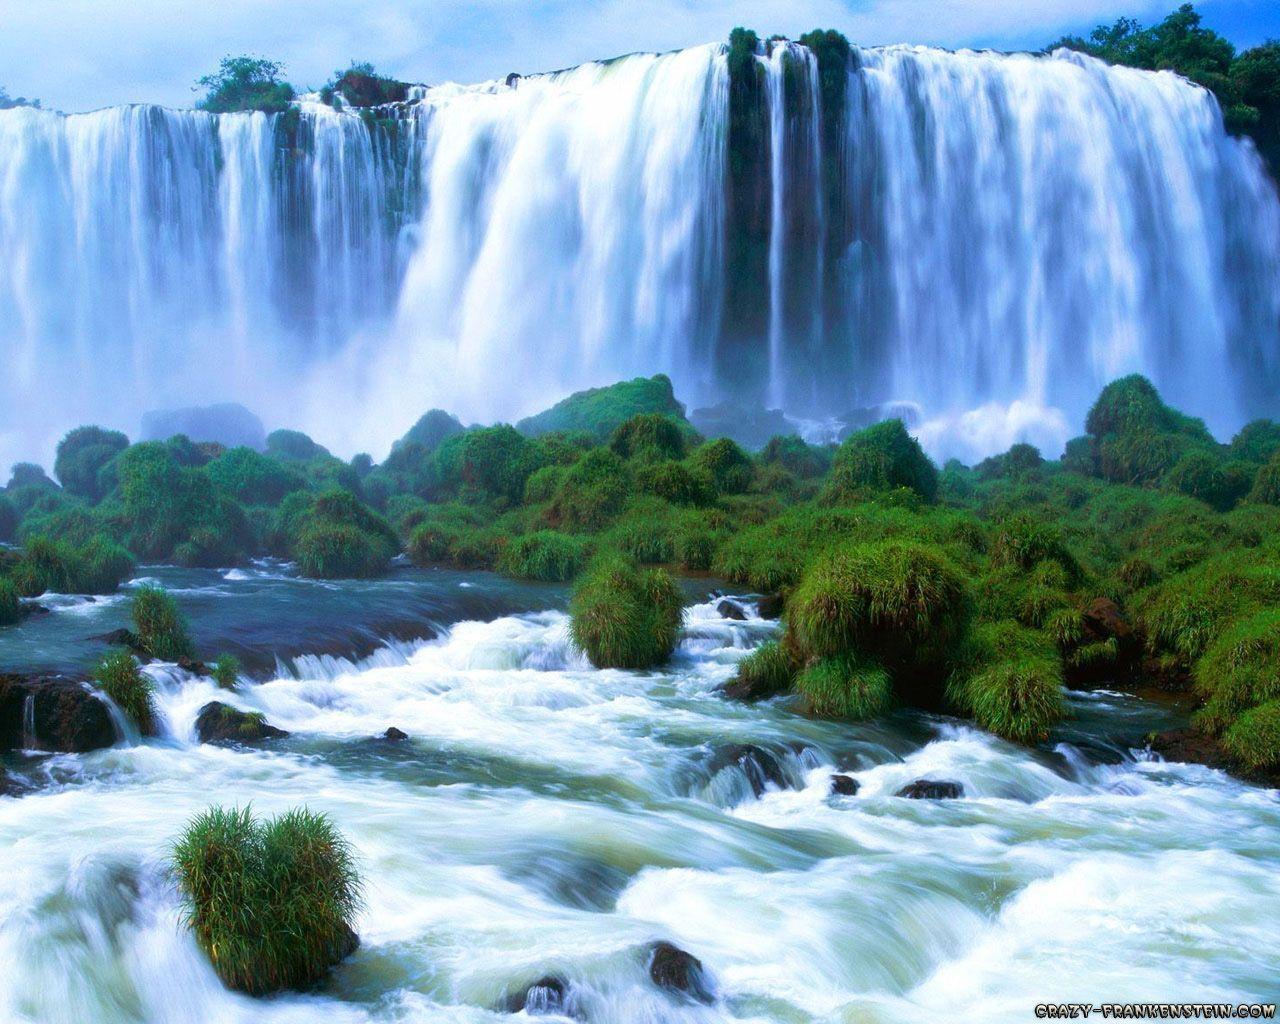 Wallpaper download nature beauty - Big Beautiful Nature Wallpaper Hd Images 3 Hd Wallpapers Eakai